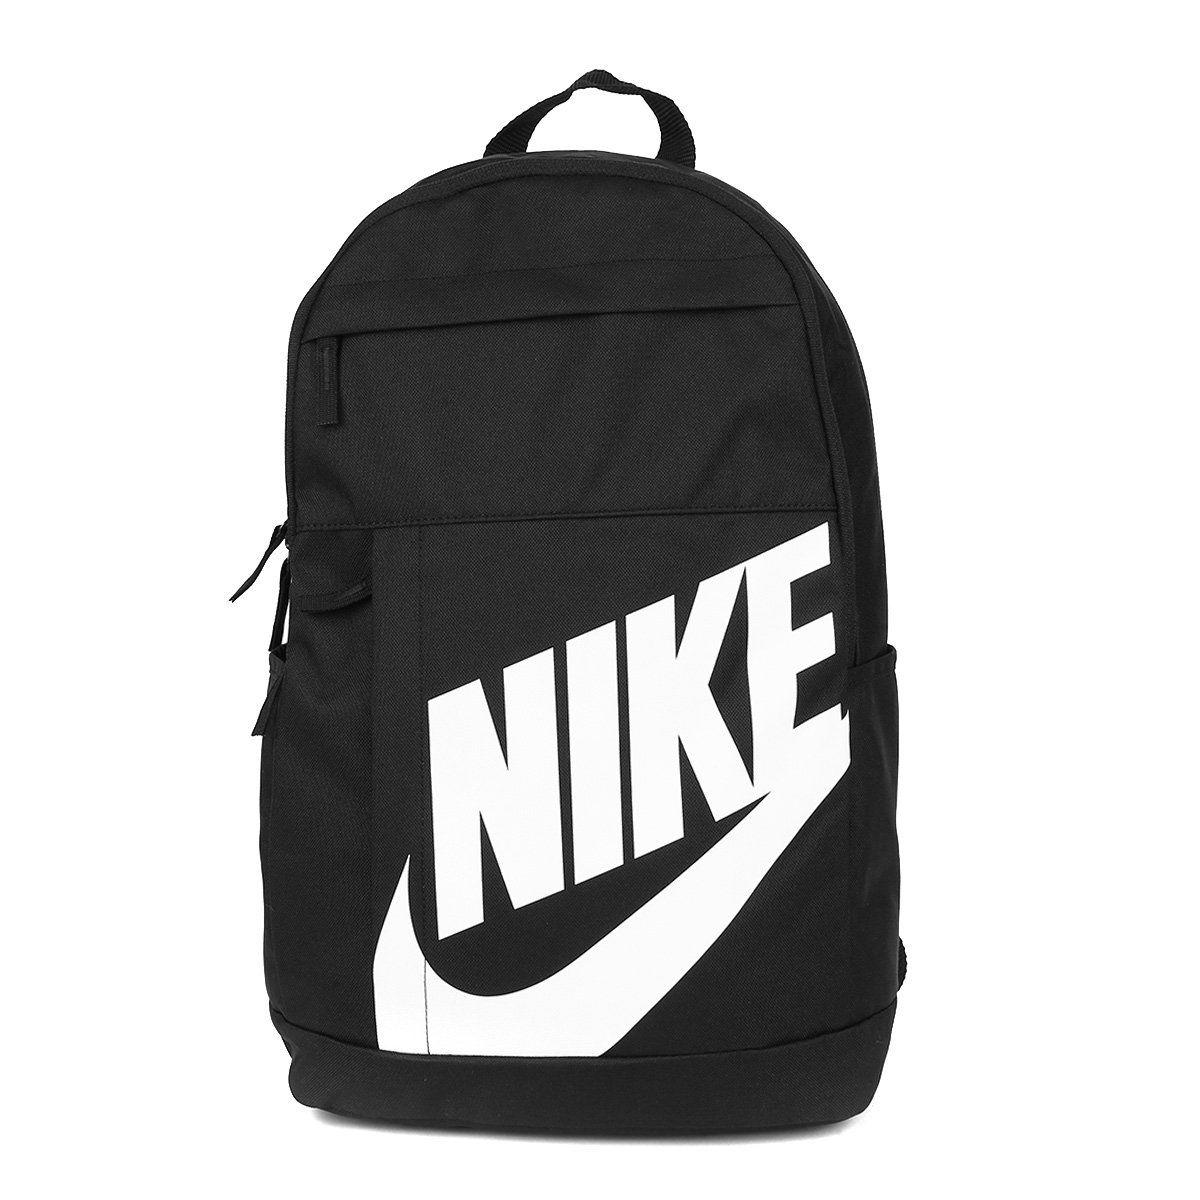 Mochila Nike Elemental 2.0 Preta e Branca